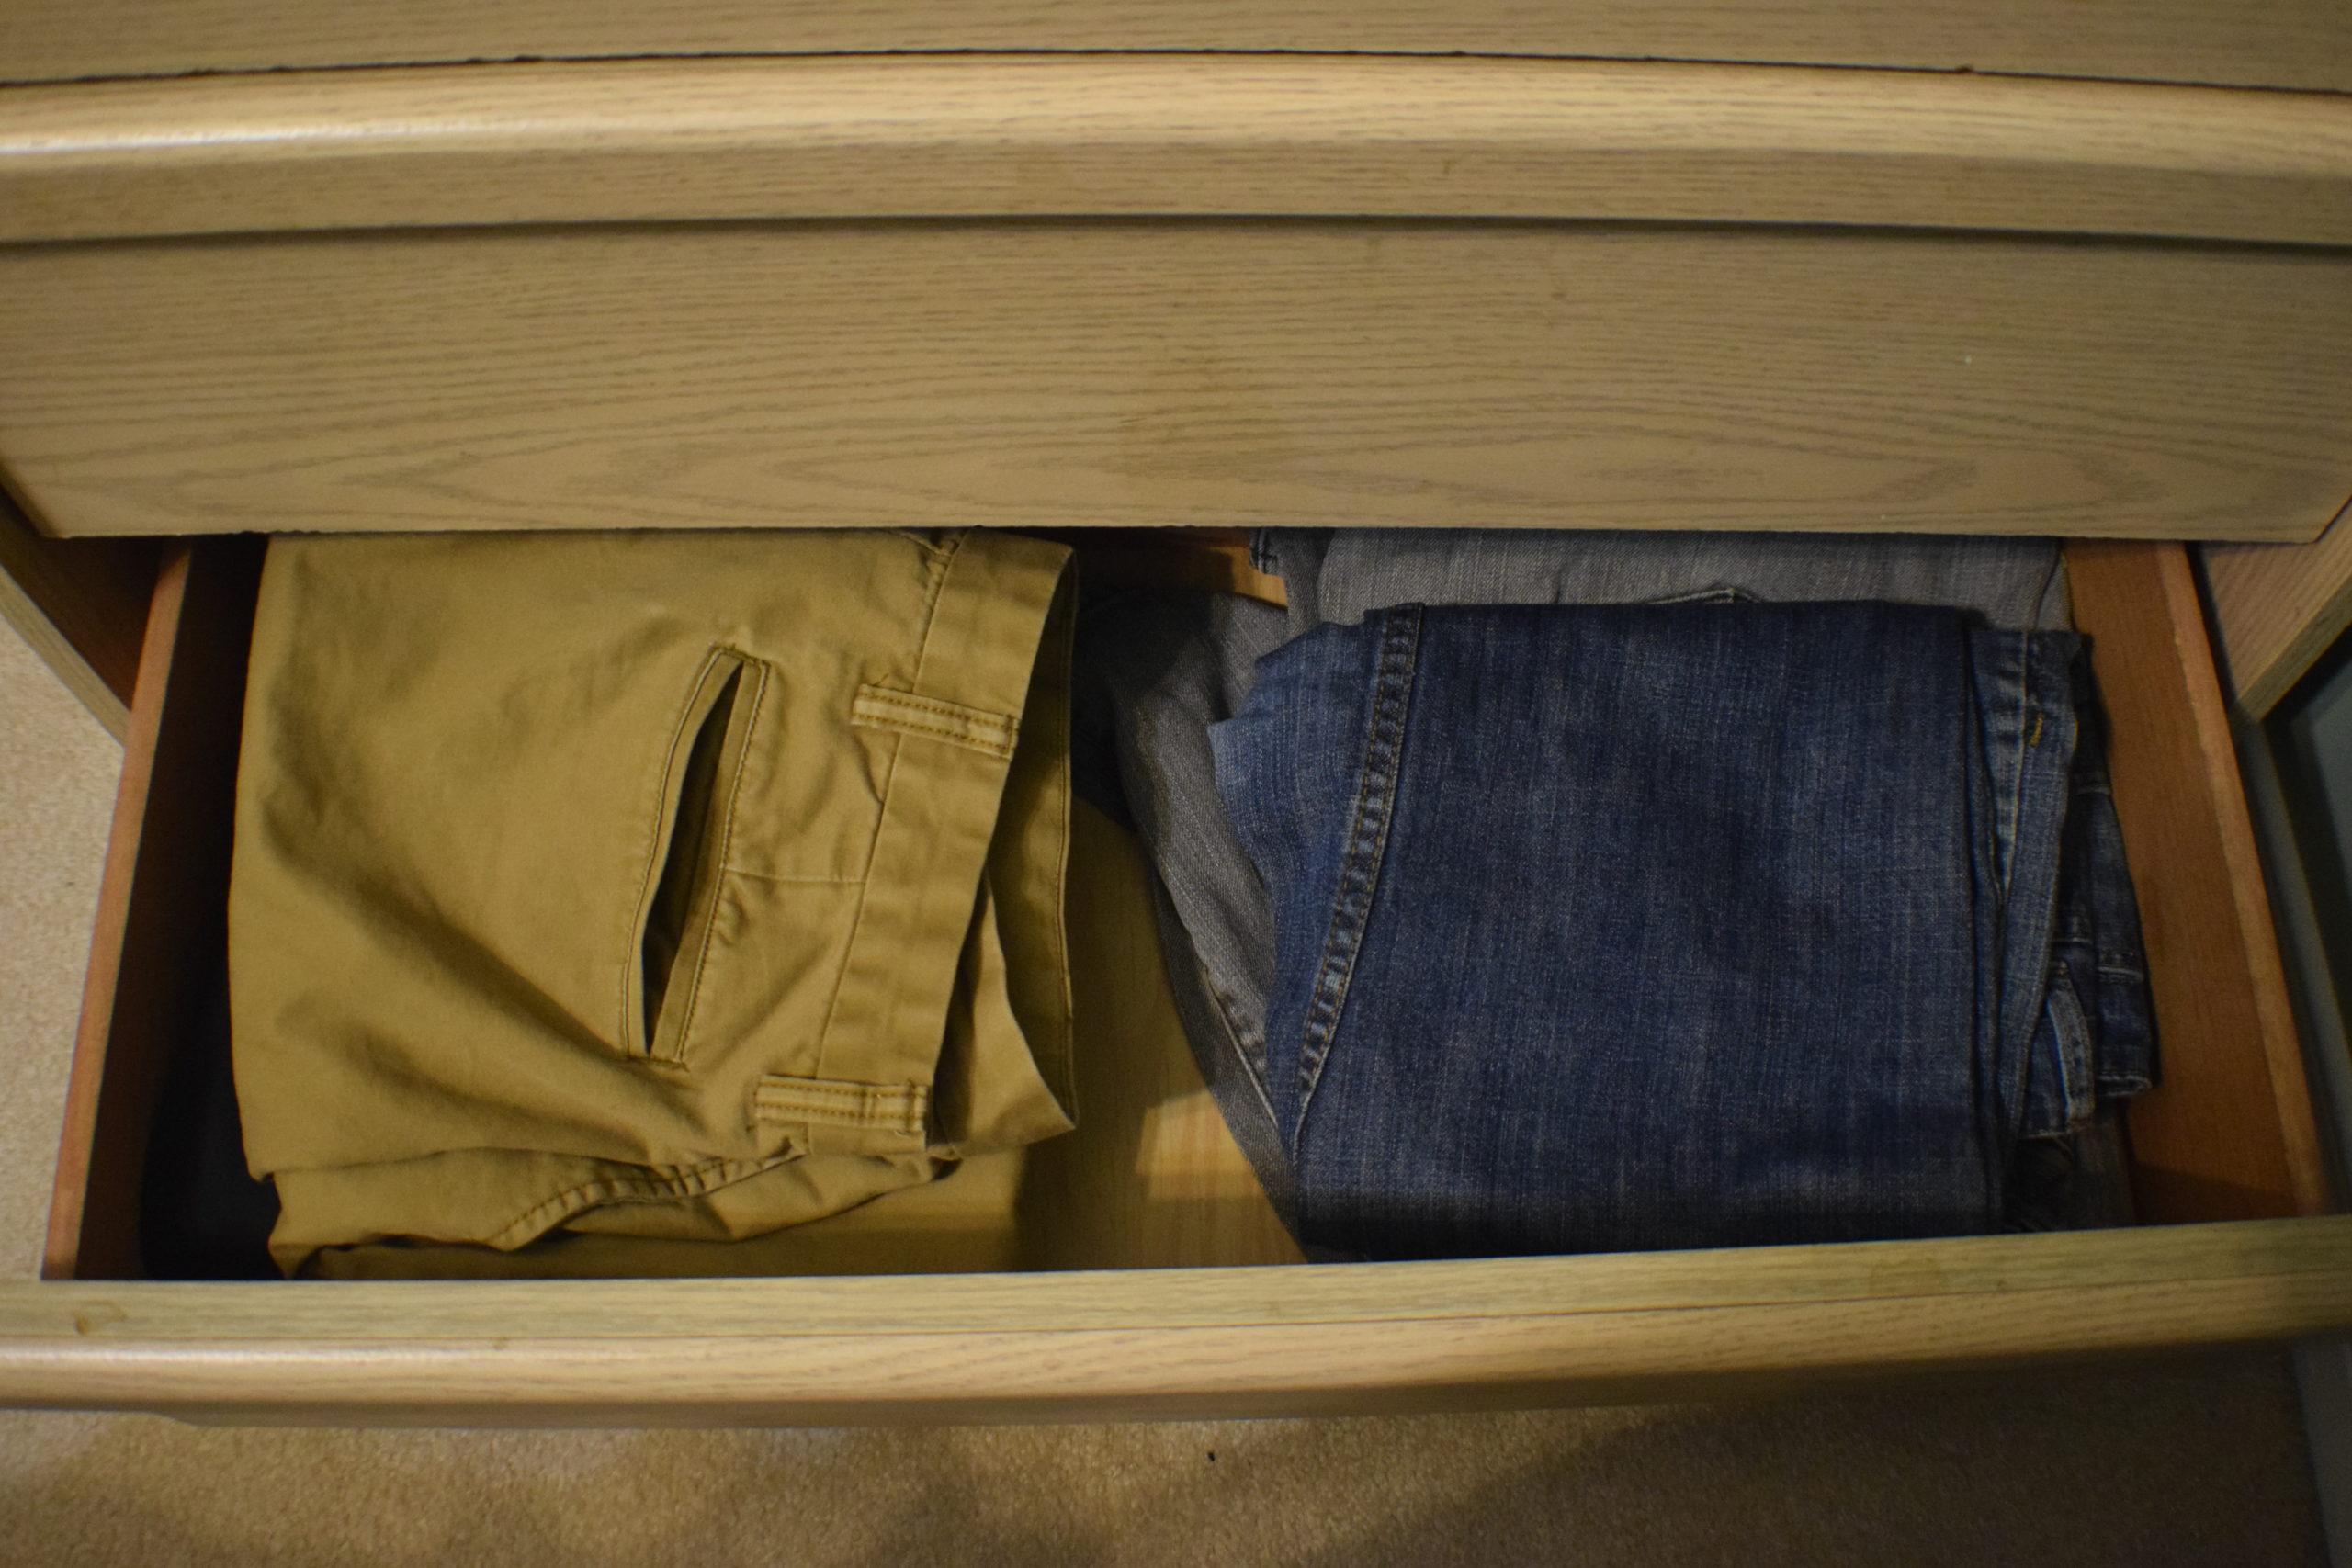 folded pants in a bottom drawer of a light wood dresser